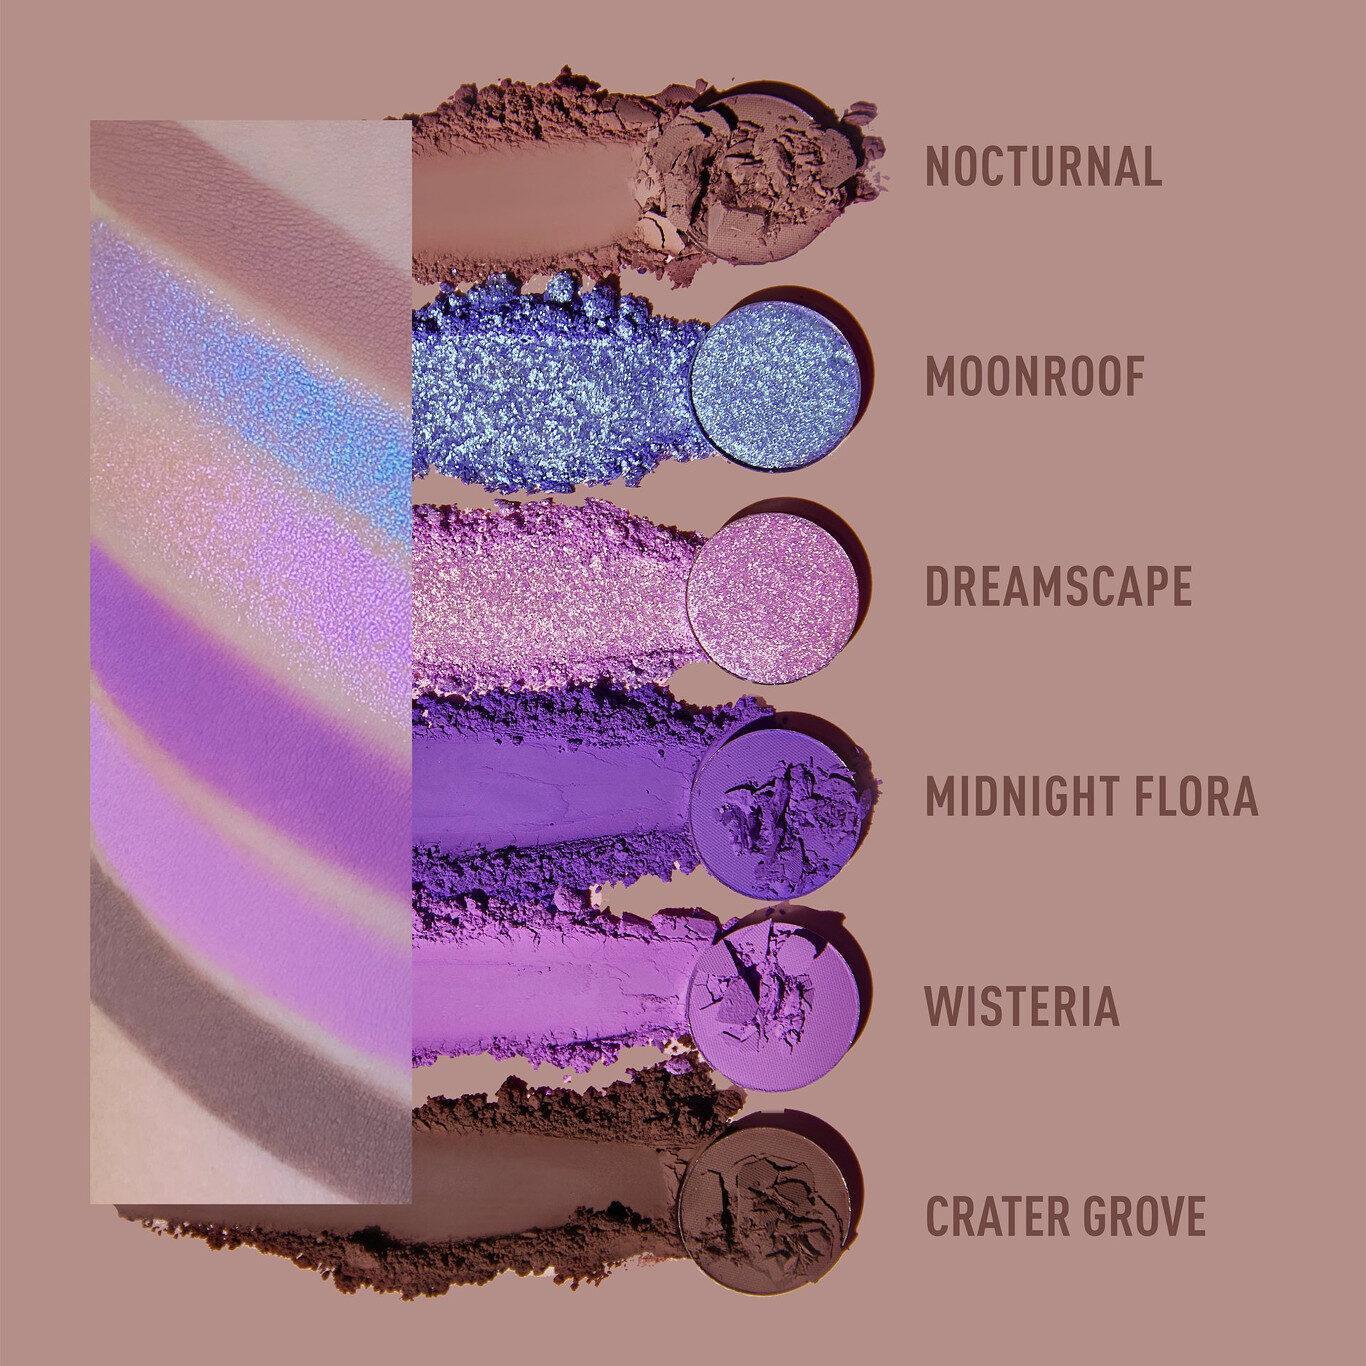 Kaleidos Makeup The Fresh Fantasy Collection Futurism VI Lunar Lavender Eyeshadow Palette Arm & Crash Swatches